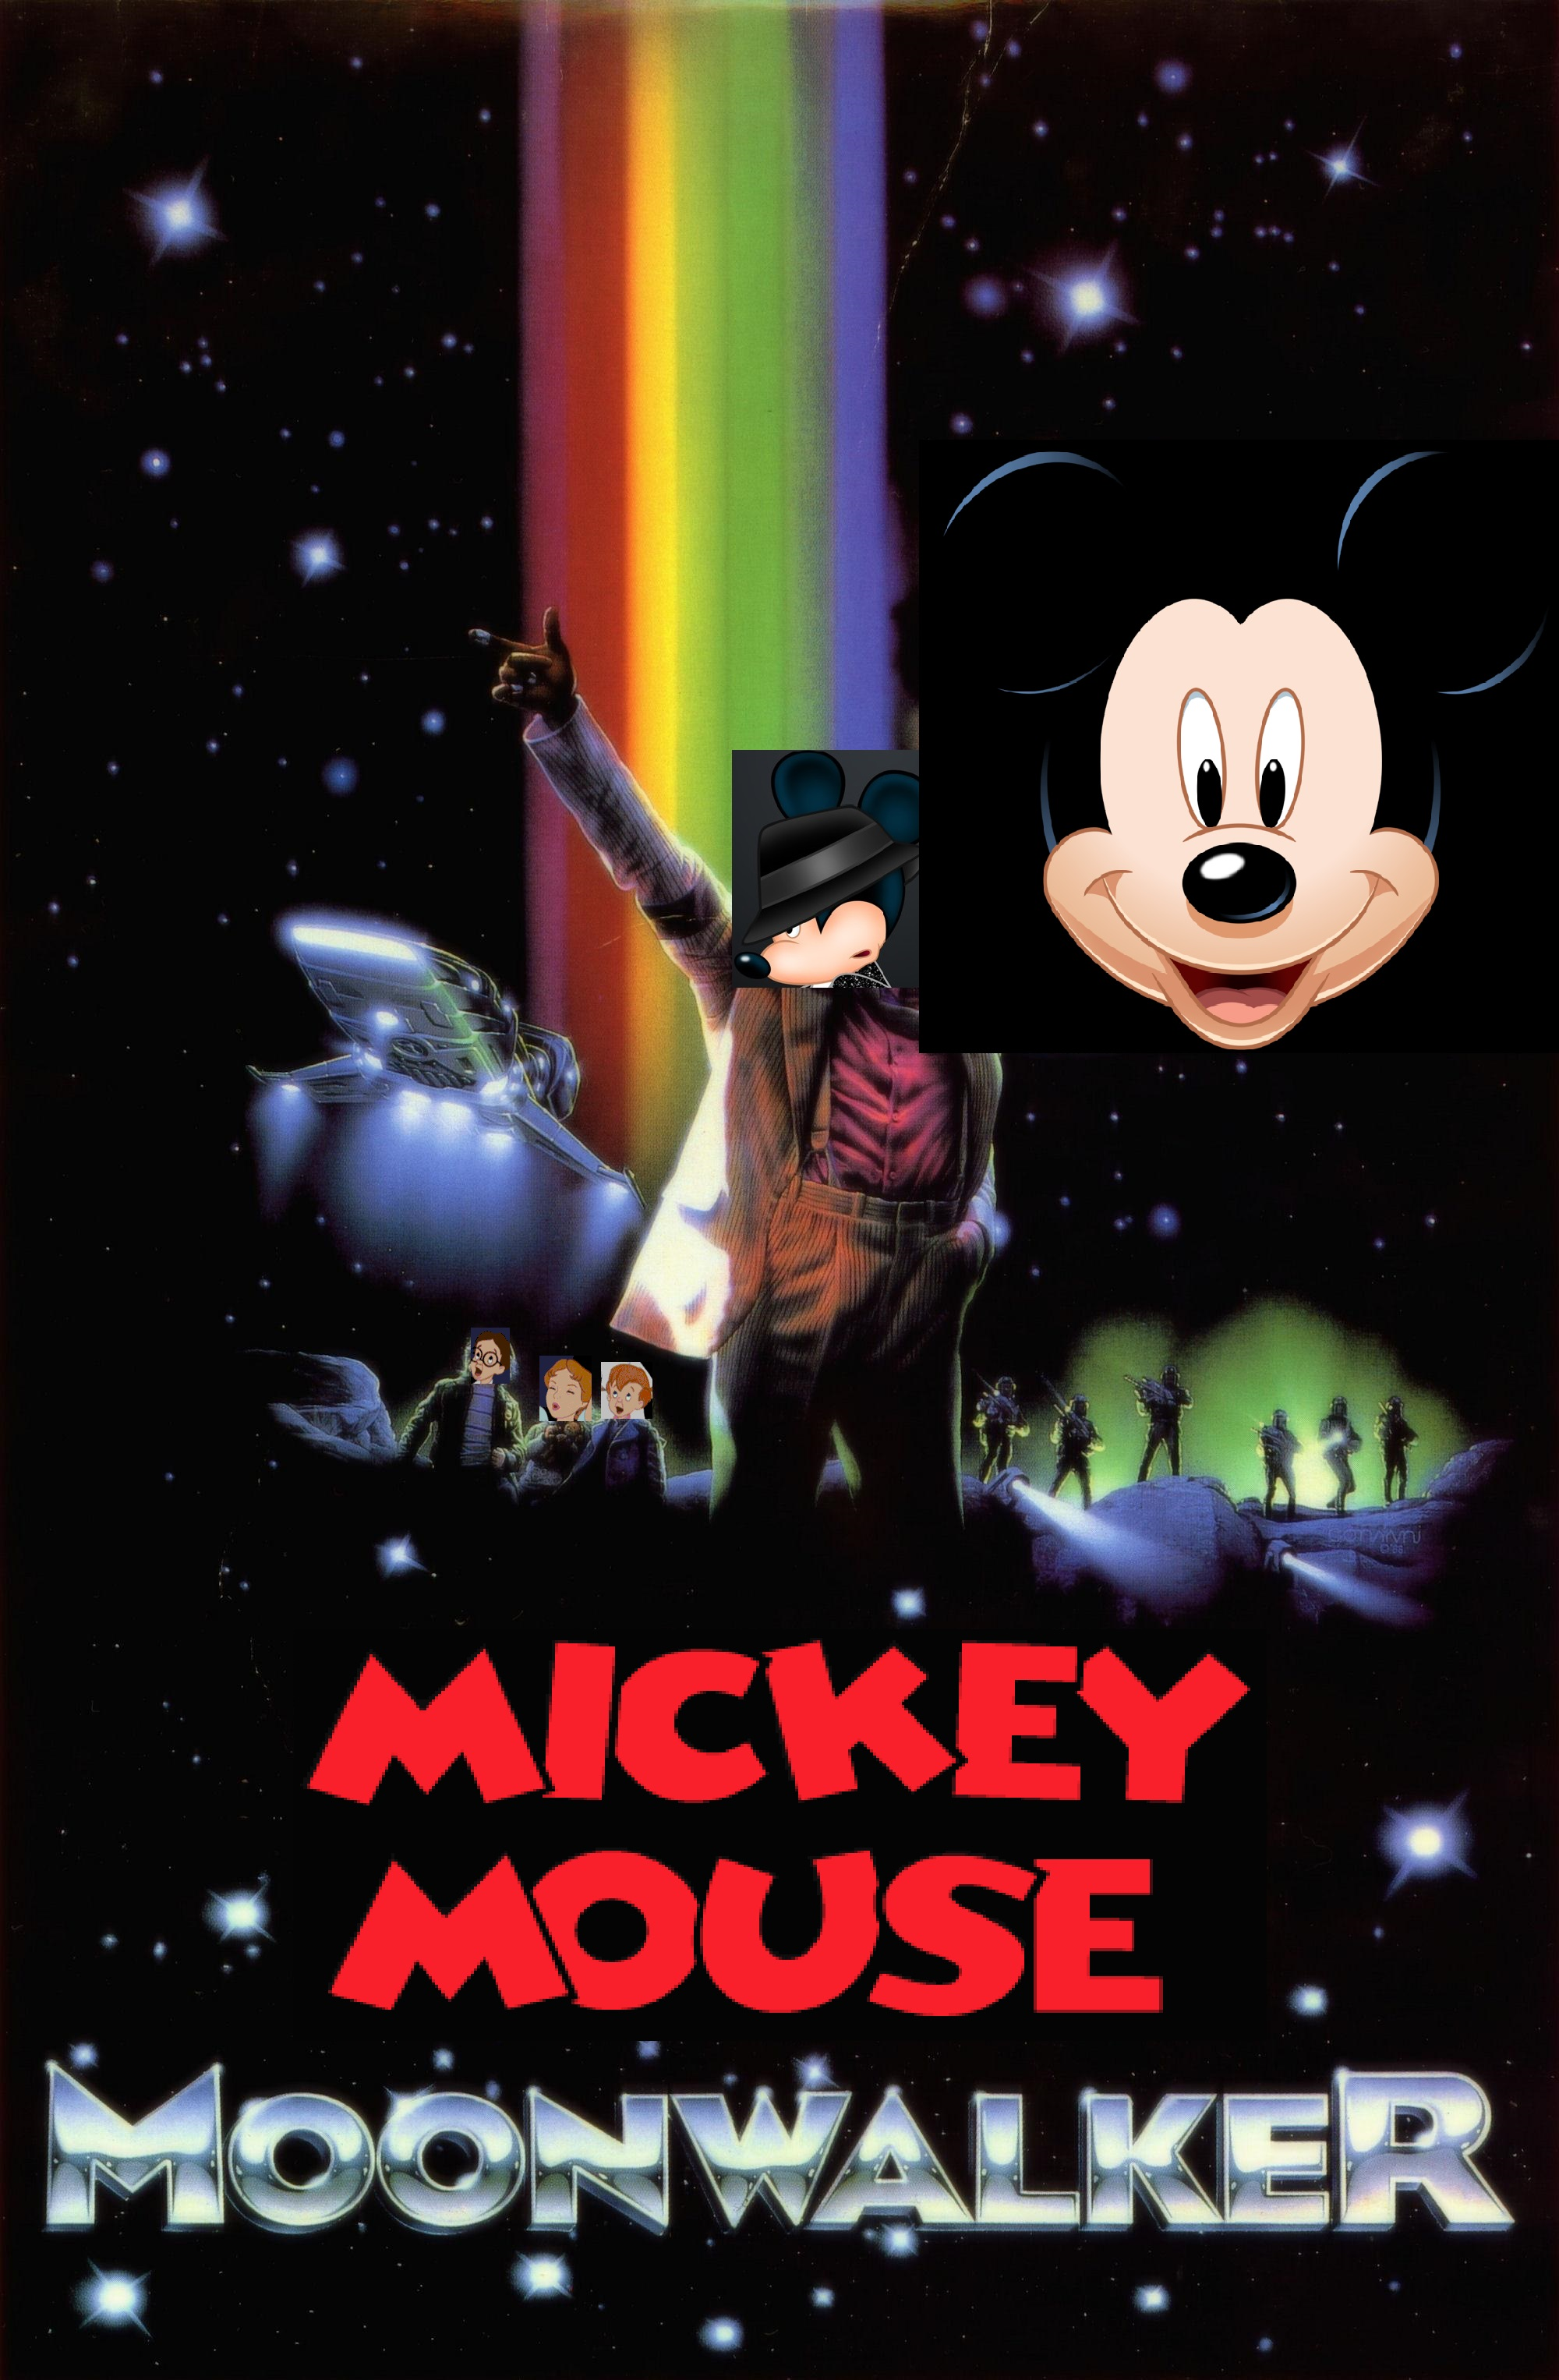 Mickey Mouse Moonwalker